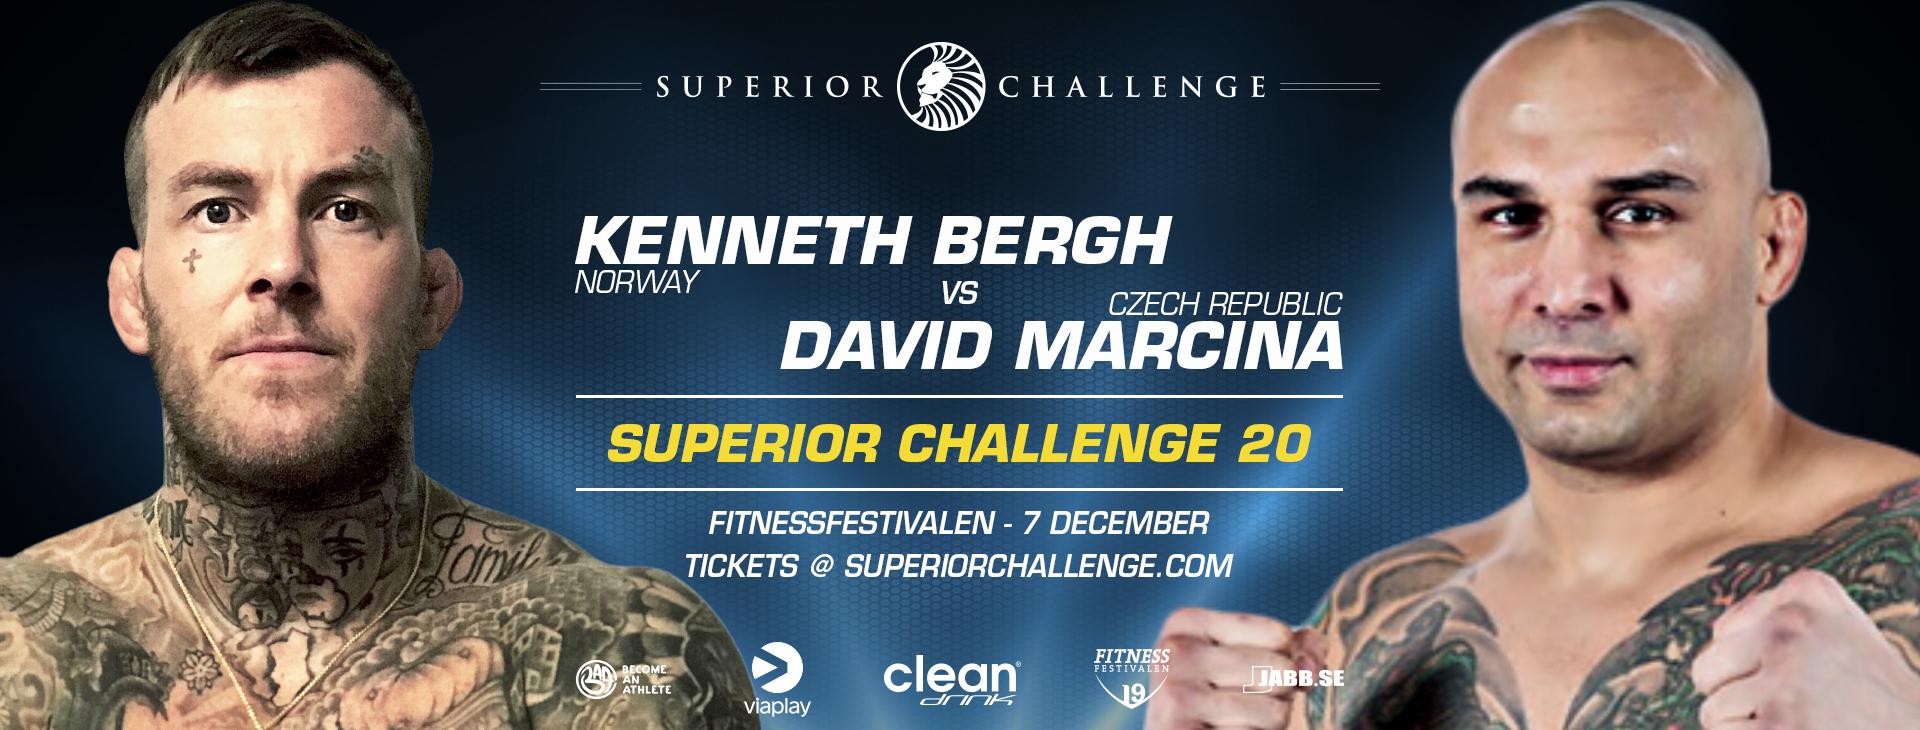 Kenneth Bergh vs David Marcina at Superior Challenge 20 - Fitnessfestivalen on December 7